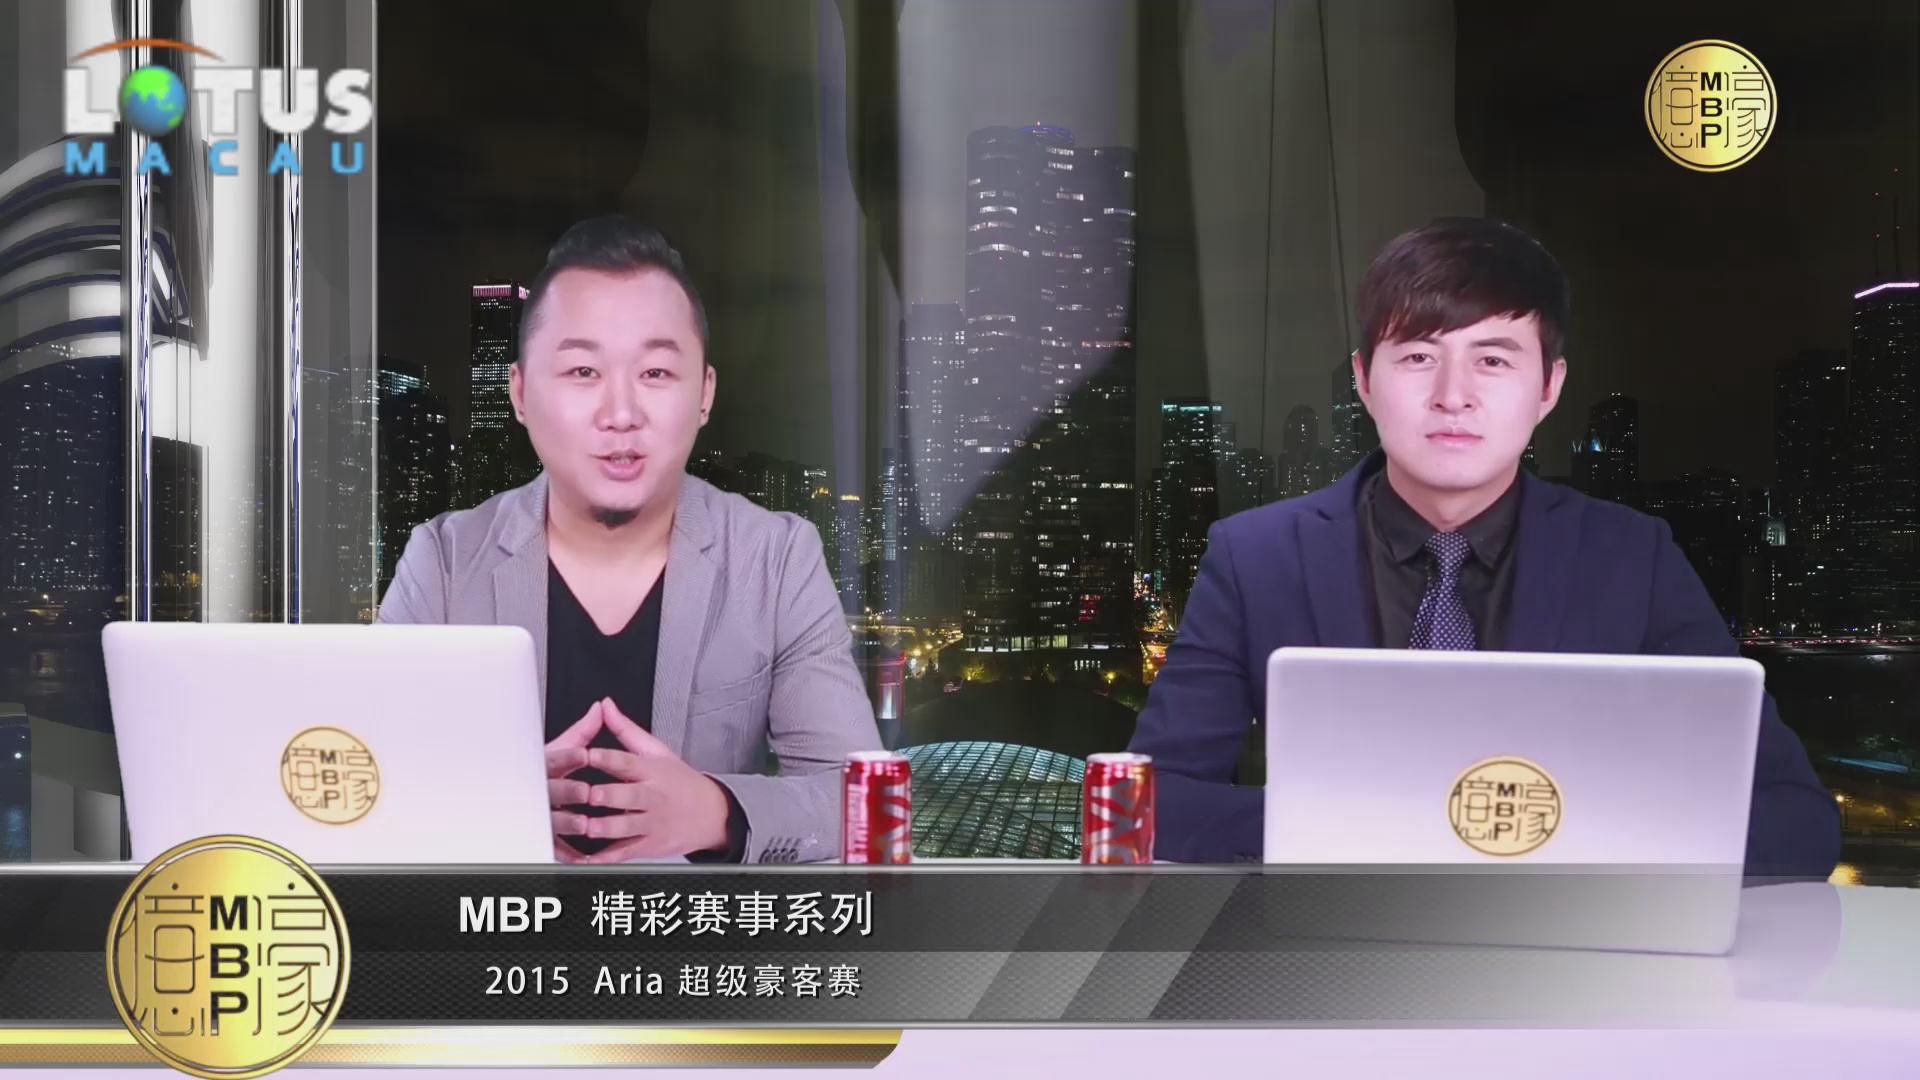 MBP精彩赛事系列第七期【Aria超级豪客赛】网络独家